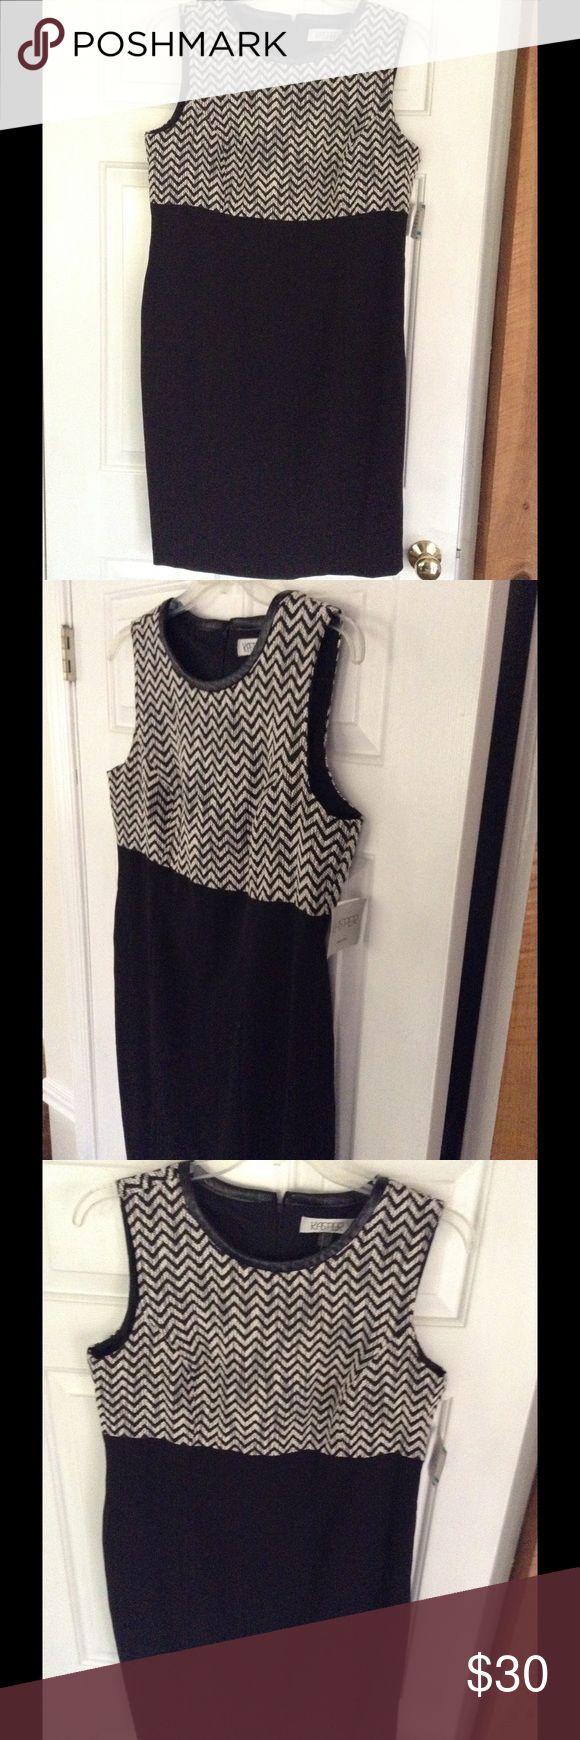 Kasper Houndstooth Sleeveless Dress Great for formal or semi casual occasions Kasper Dresses